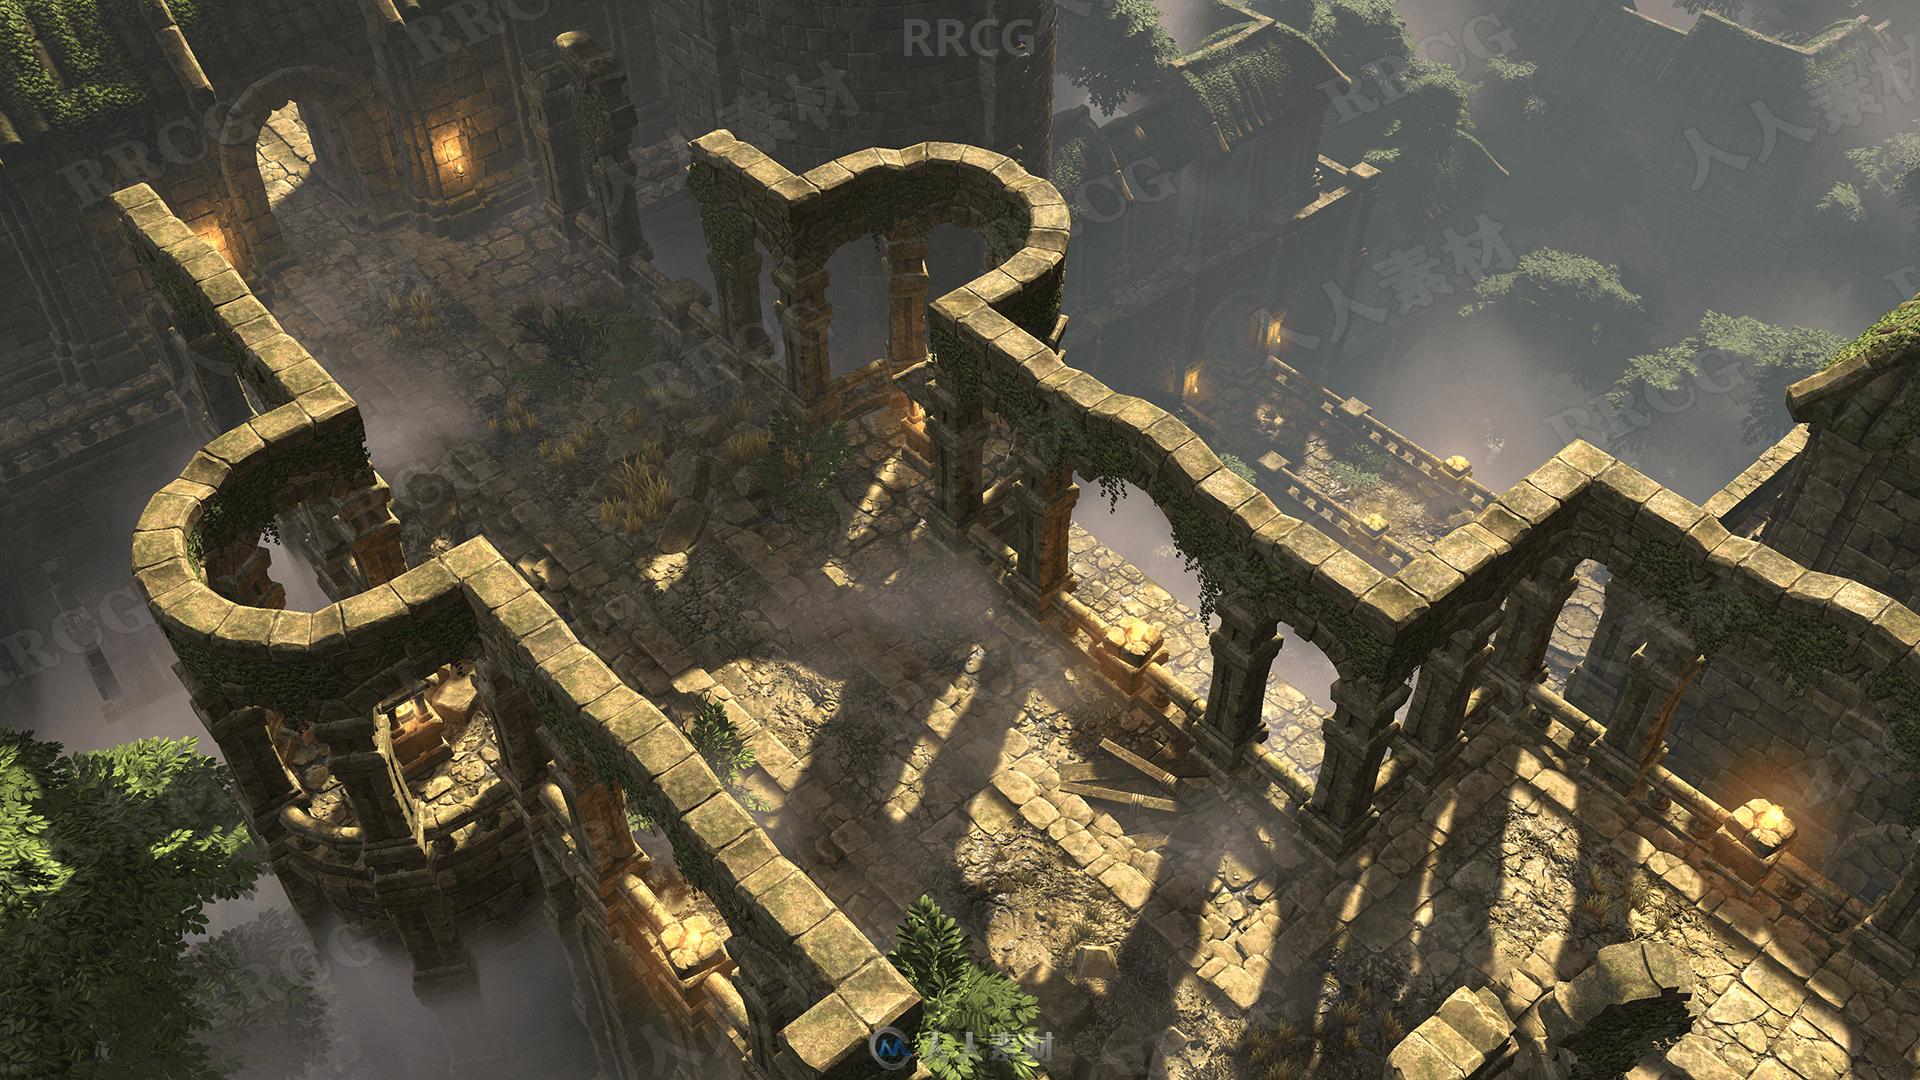 3D风格化寺庙场景环境Unreal Engine游戏素材资源